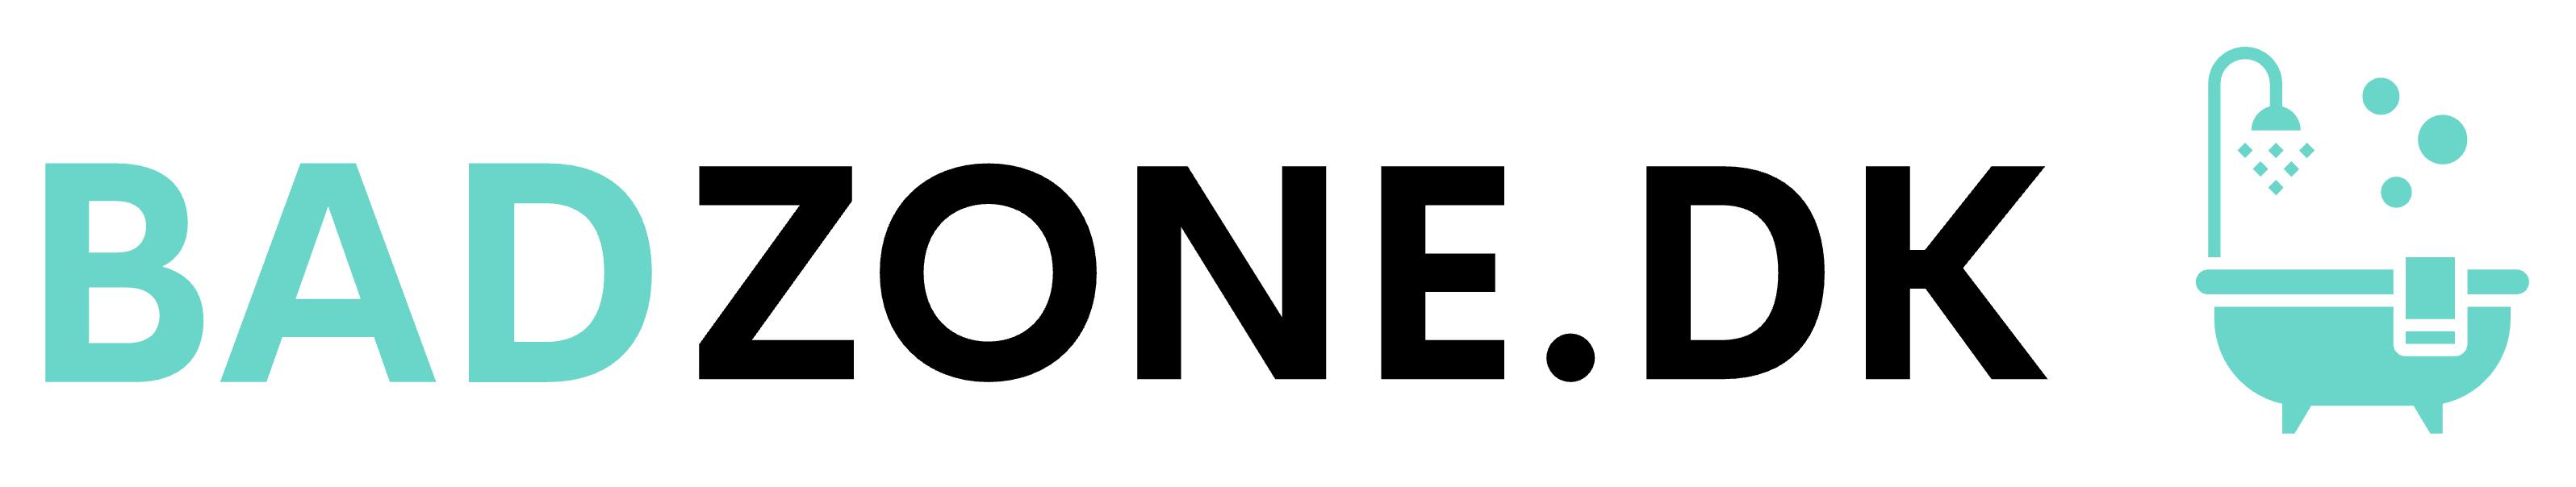 Badzone logo